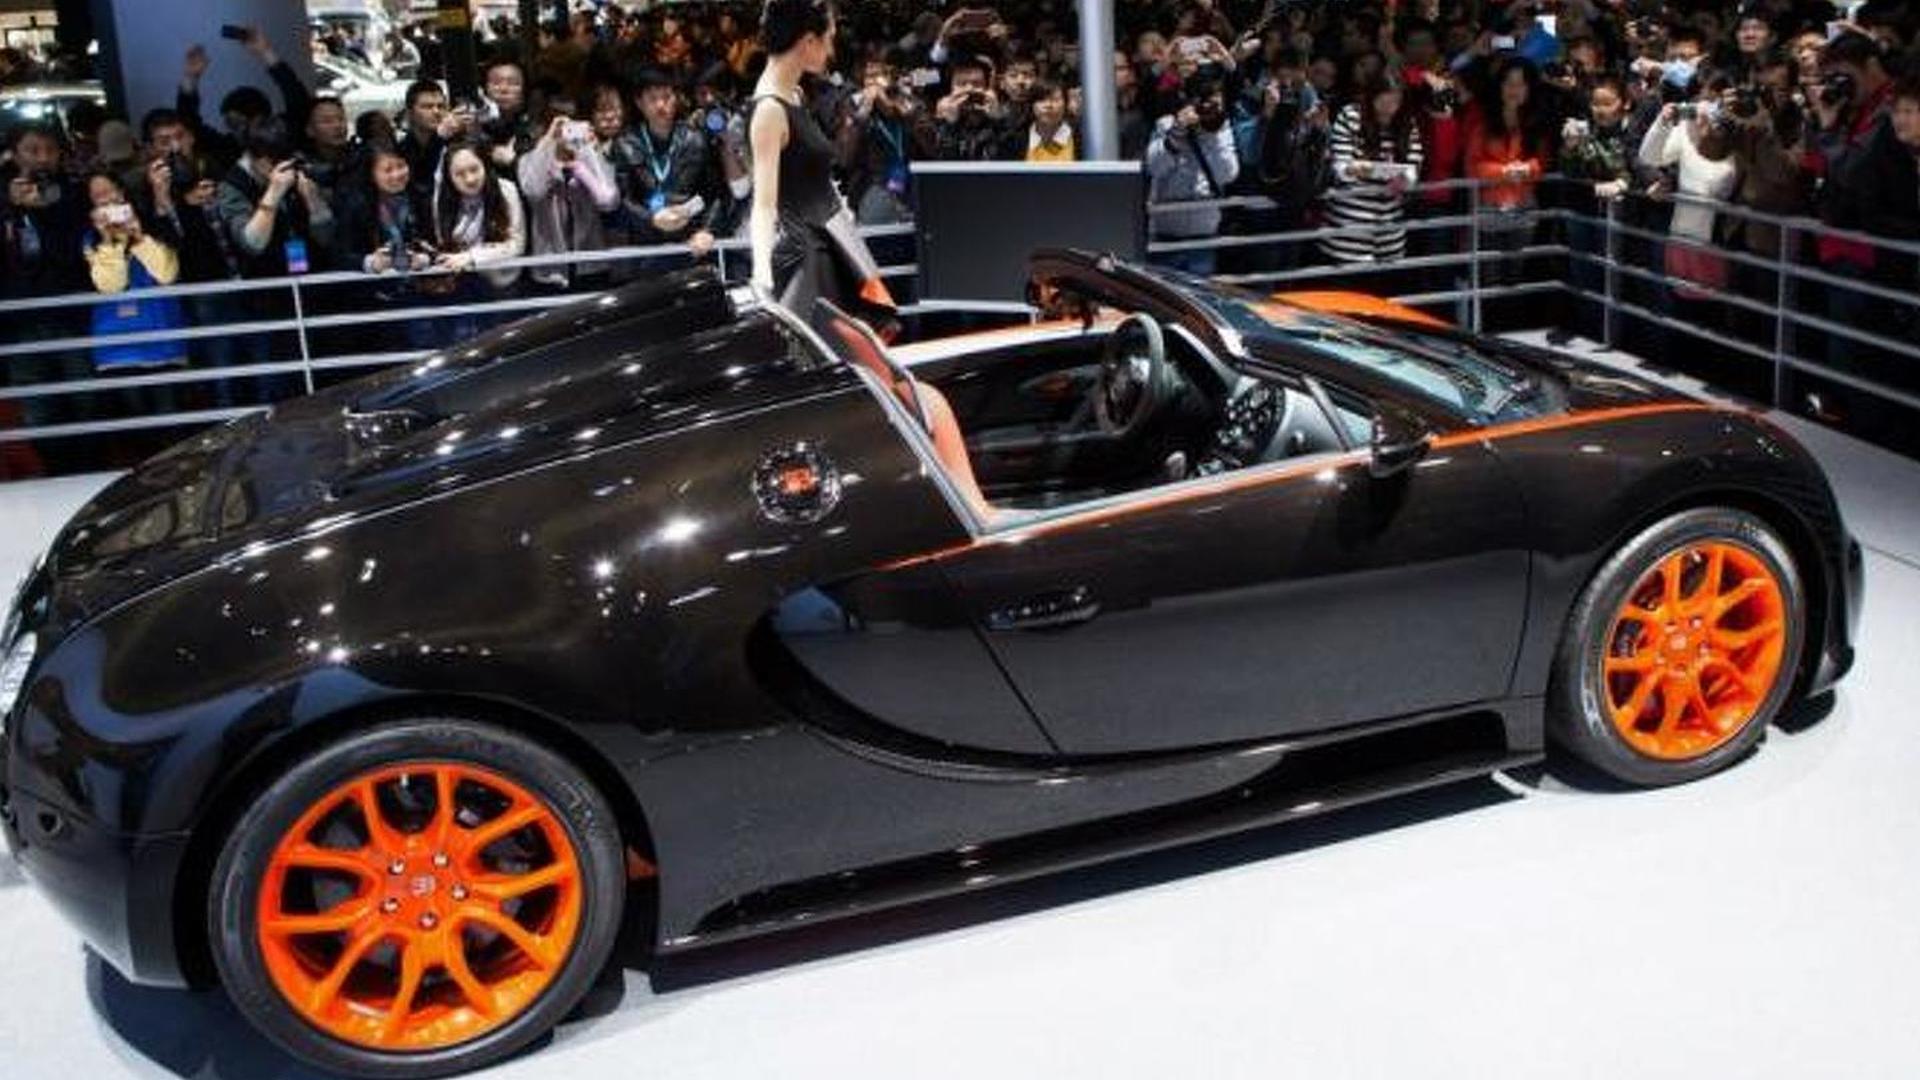 2013-380180-bugatti-veyron-grand-sport-vitesse-world-record-car-edition-at-2013-auto-shang1 Inspiring Bugatti Veyron Grand Sport Vitesse Wrc Cars Trend